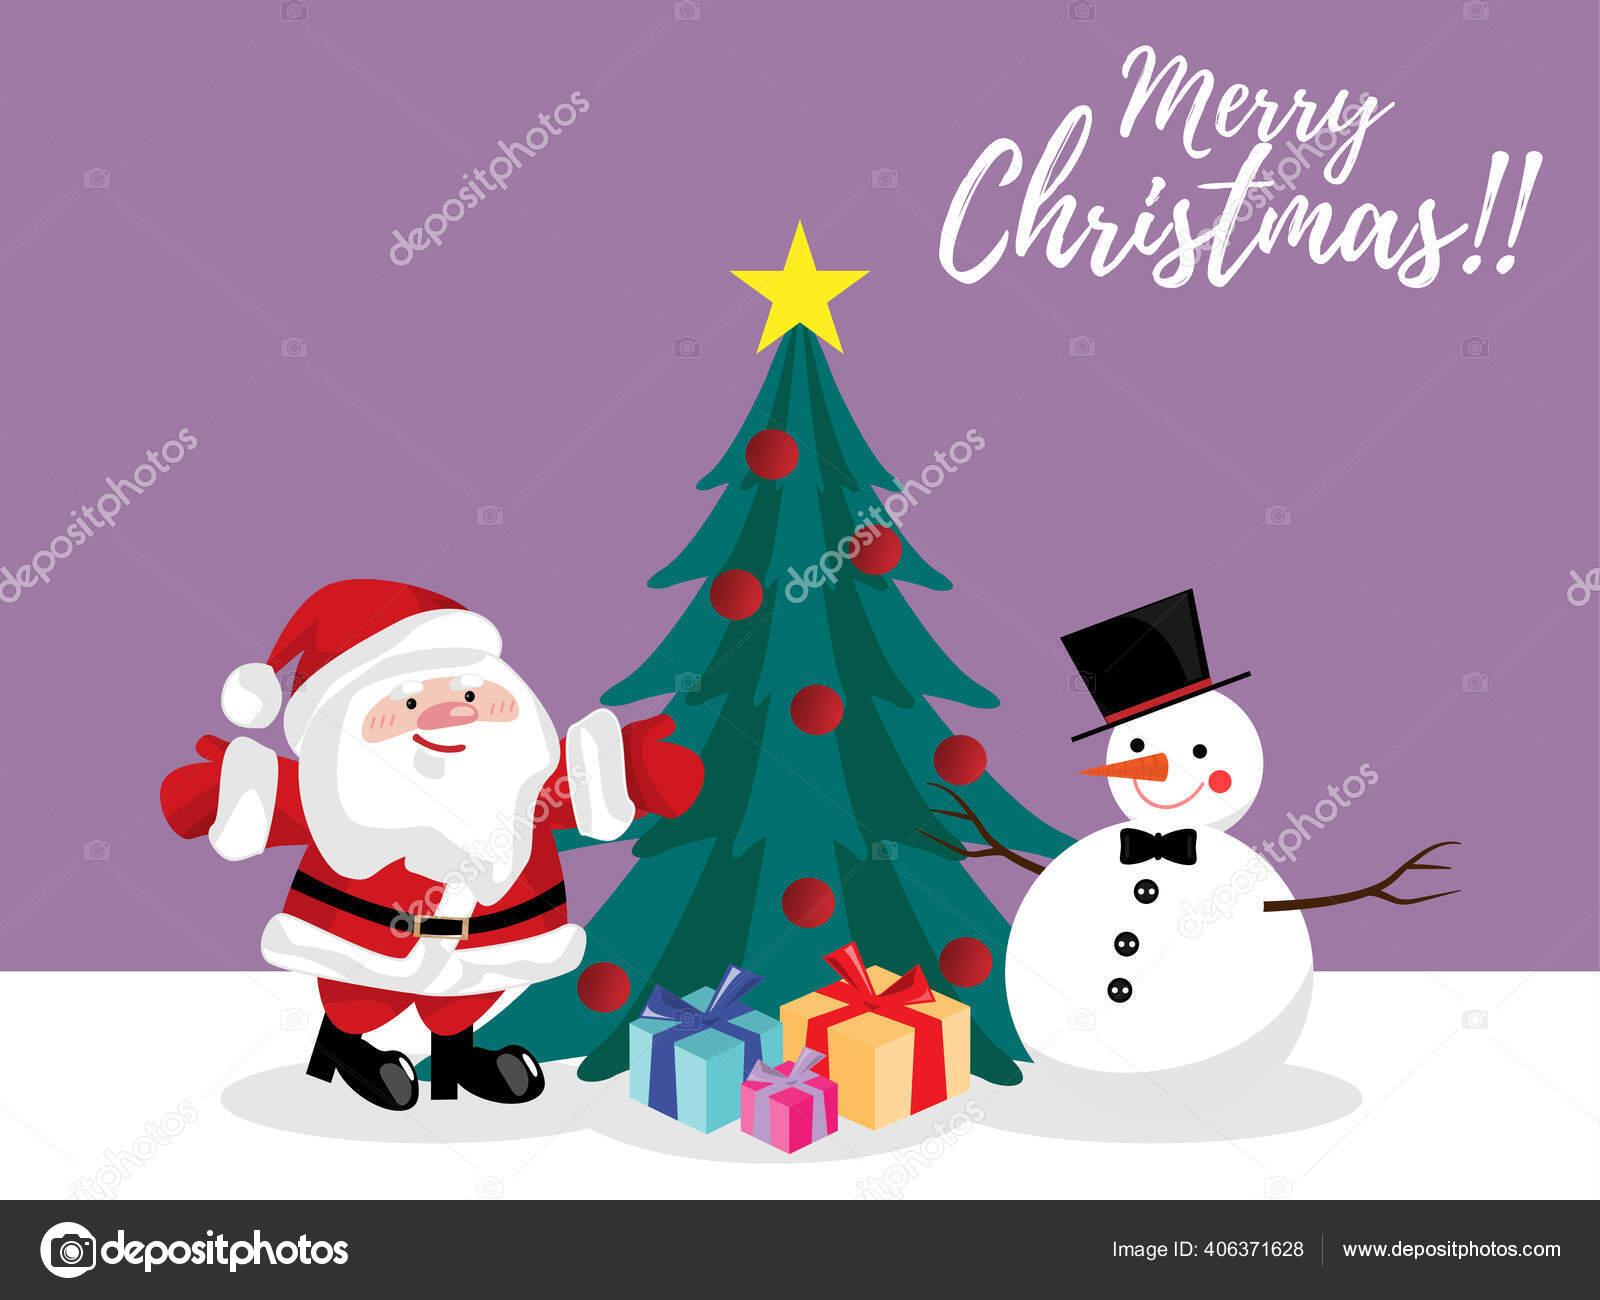 Christmas Cartoon Santa Claus Snowman Christmas Tree Gift Box Snow Stock Vector C Winezdolly Hotmail Com 406371628